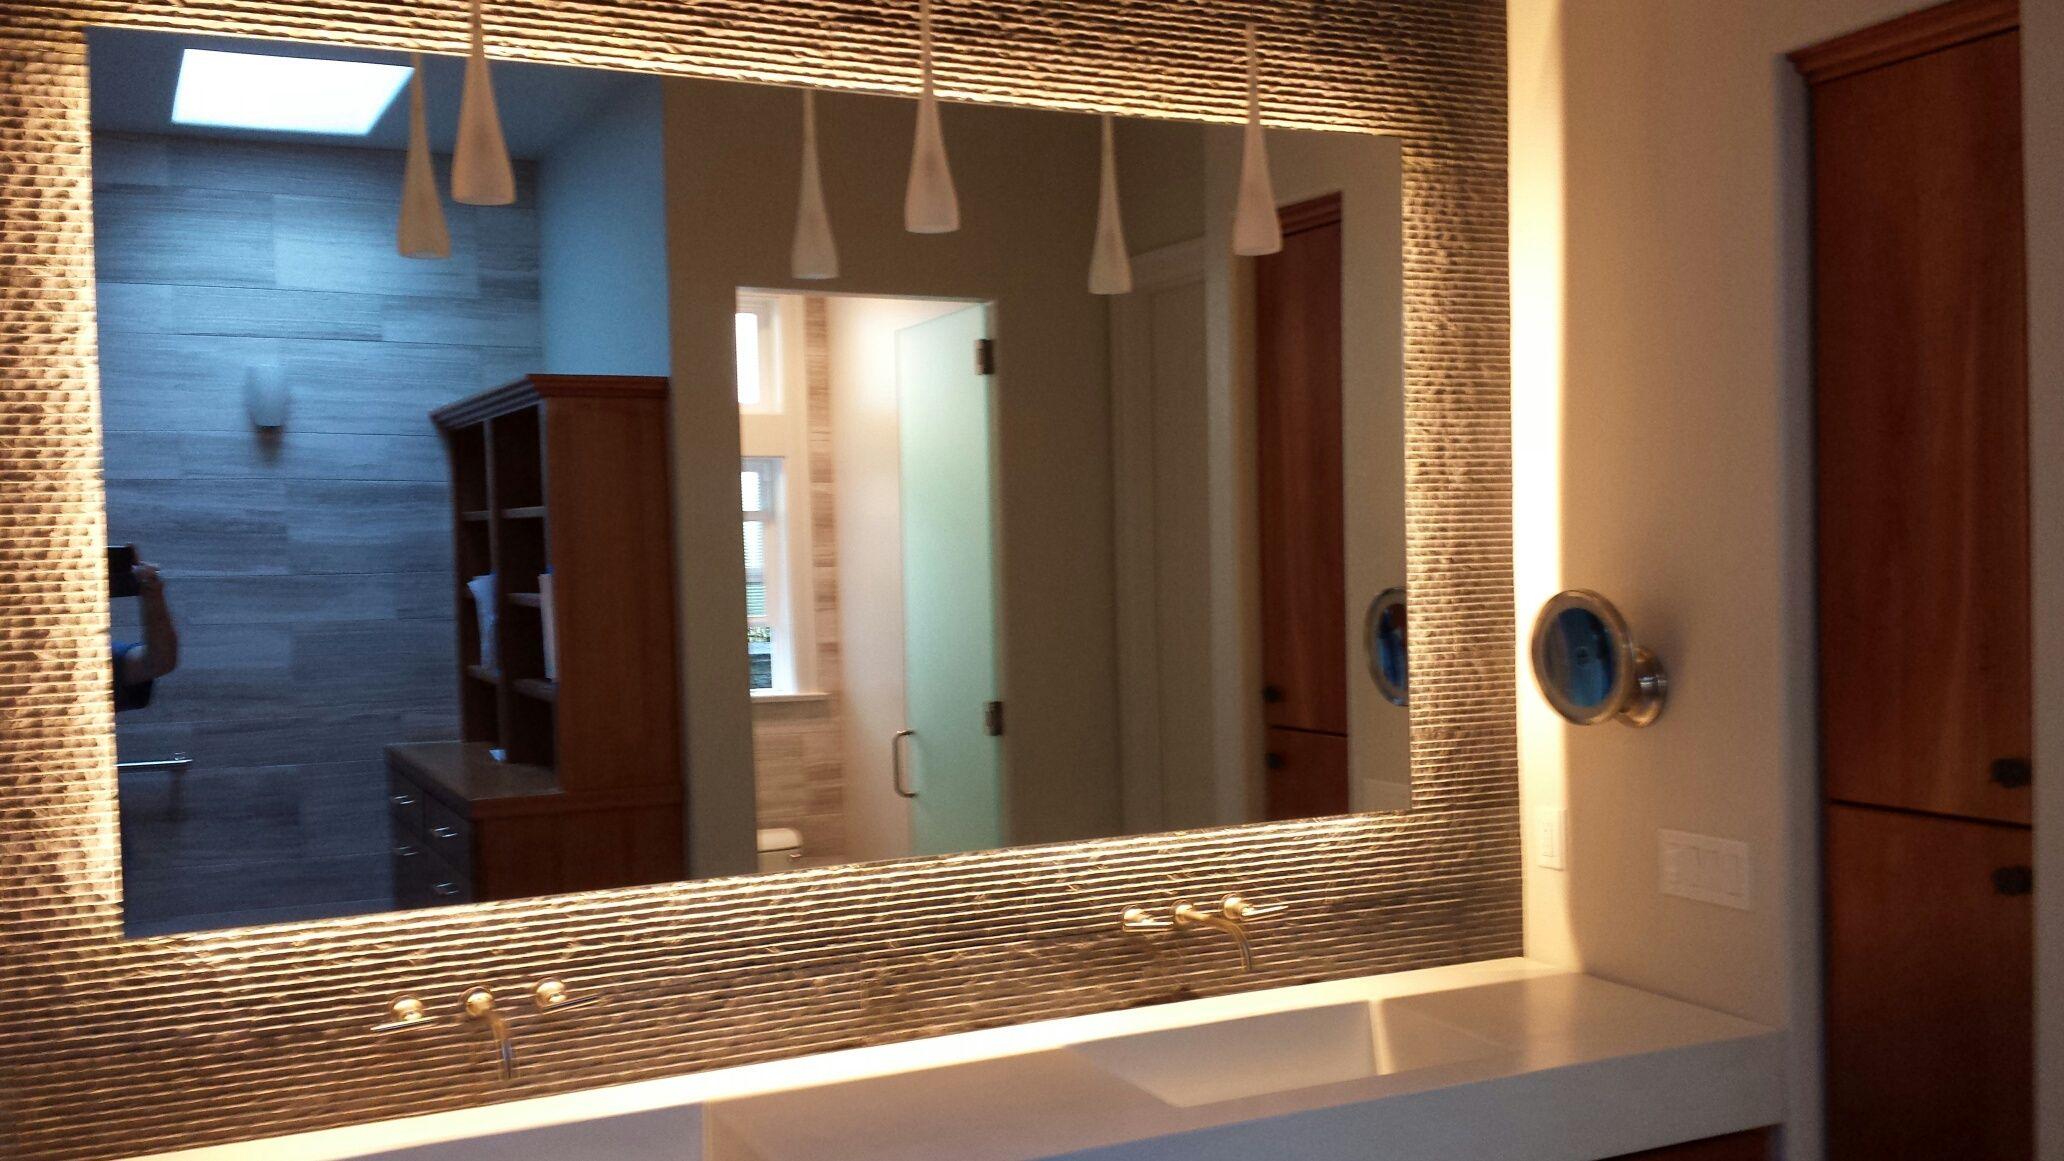 Floating Back Lit Mirror Forest Heights Remodel Pinterest - Portland bathroom remodeling contractor